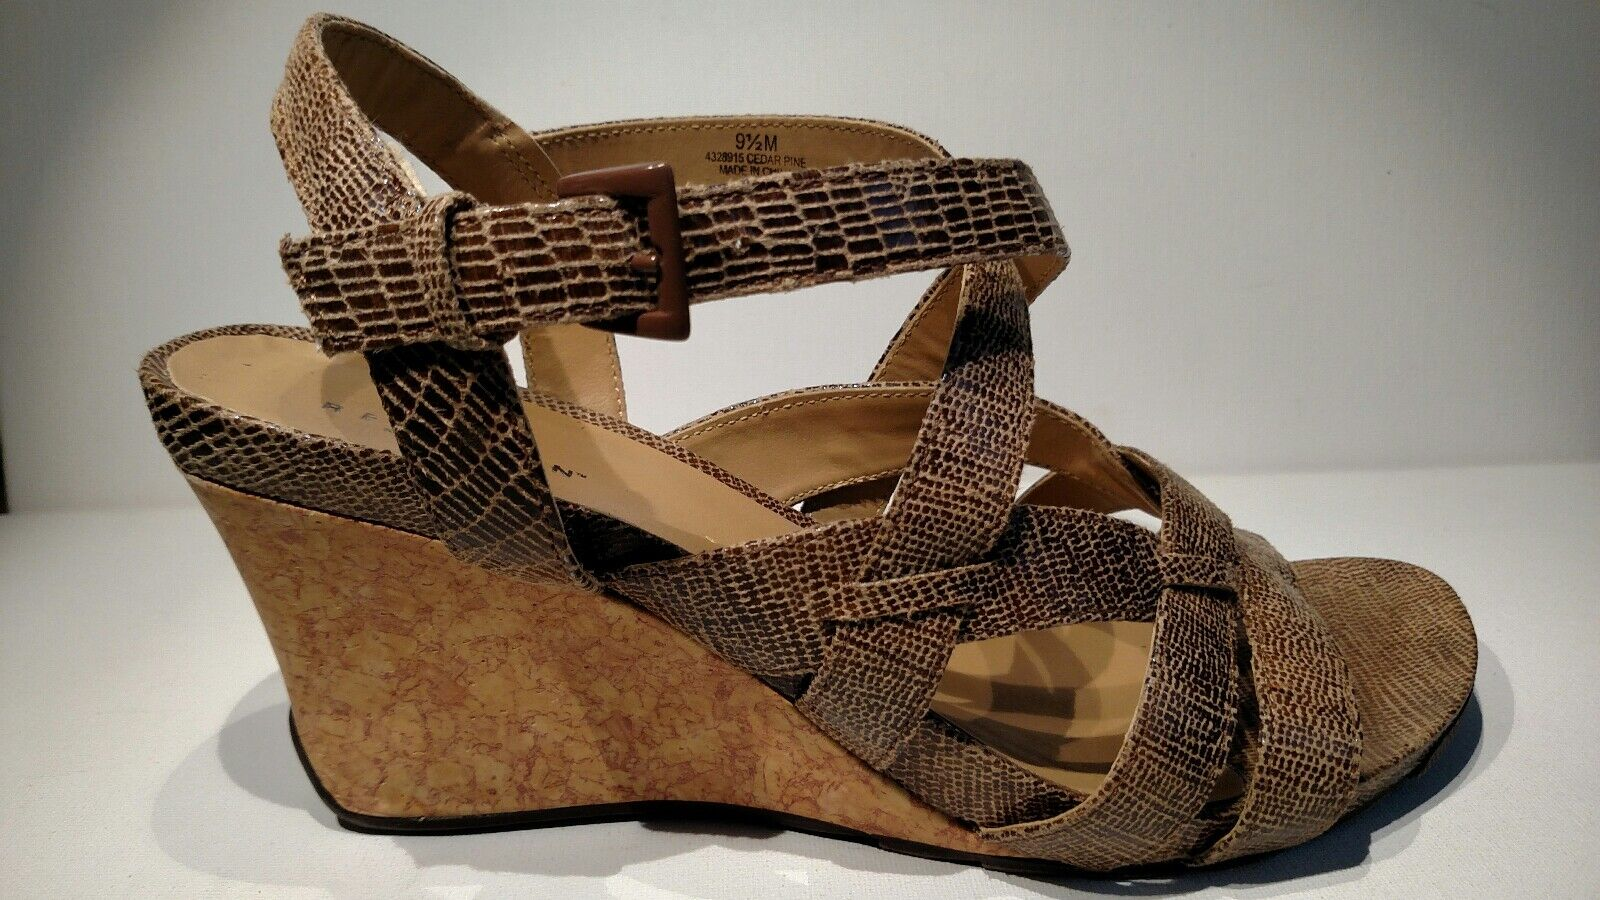 KENNETH COLE Reaction Sz9.5 3.5 brown sandal wedge buckle straps 3.5 Sz9.5 tall b9fa7a